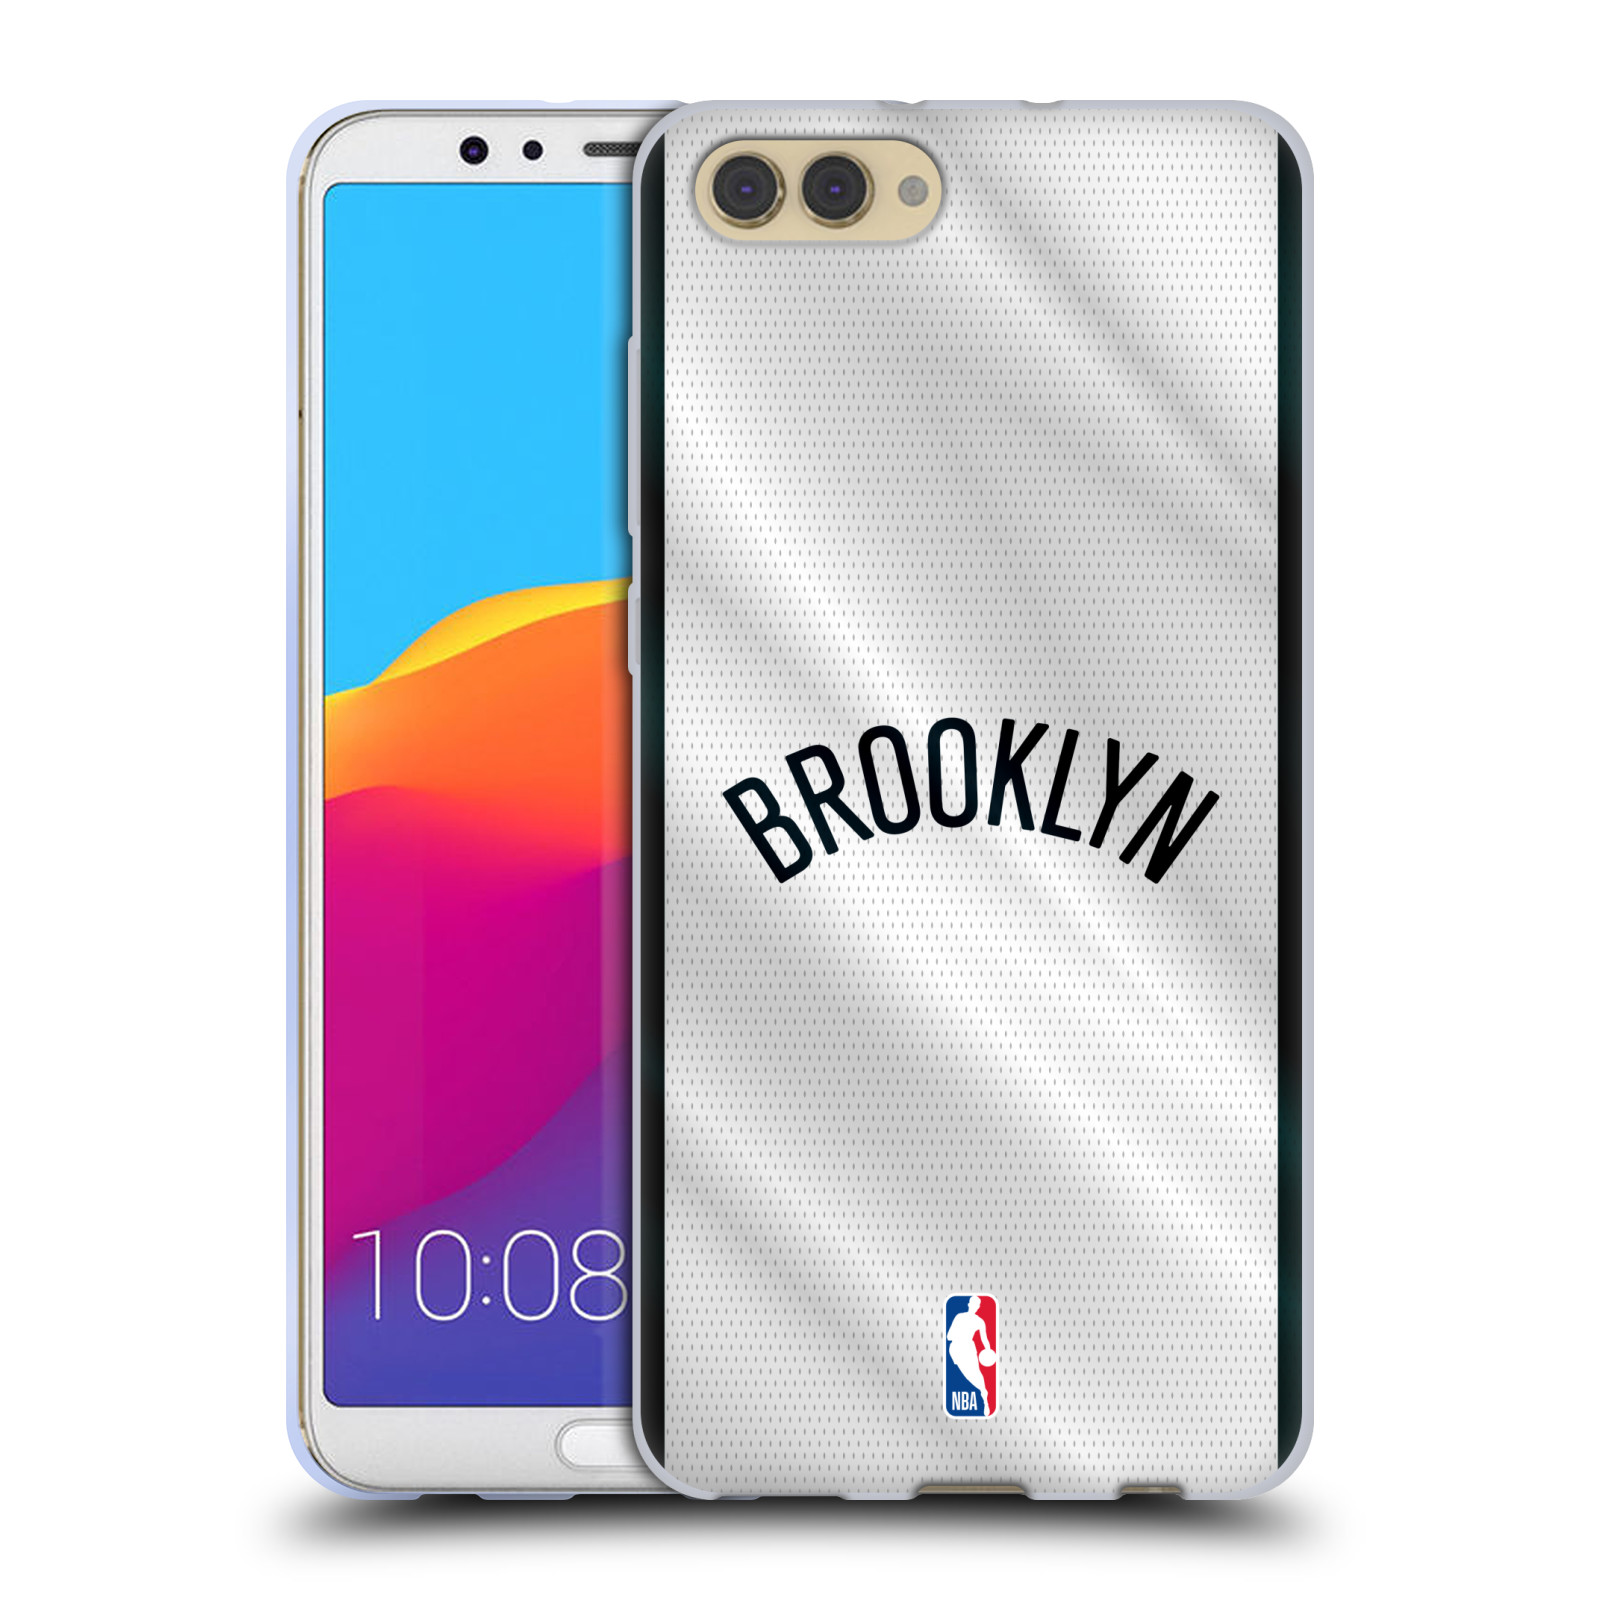 HEAD CASE silikonový obal na mobil Huawei HONOR VIEW 10 / V10 NBA Basketbalový klub Brooklyn Nets nápis